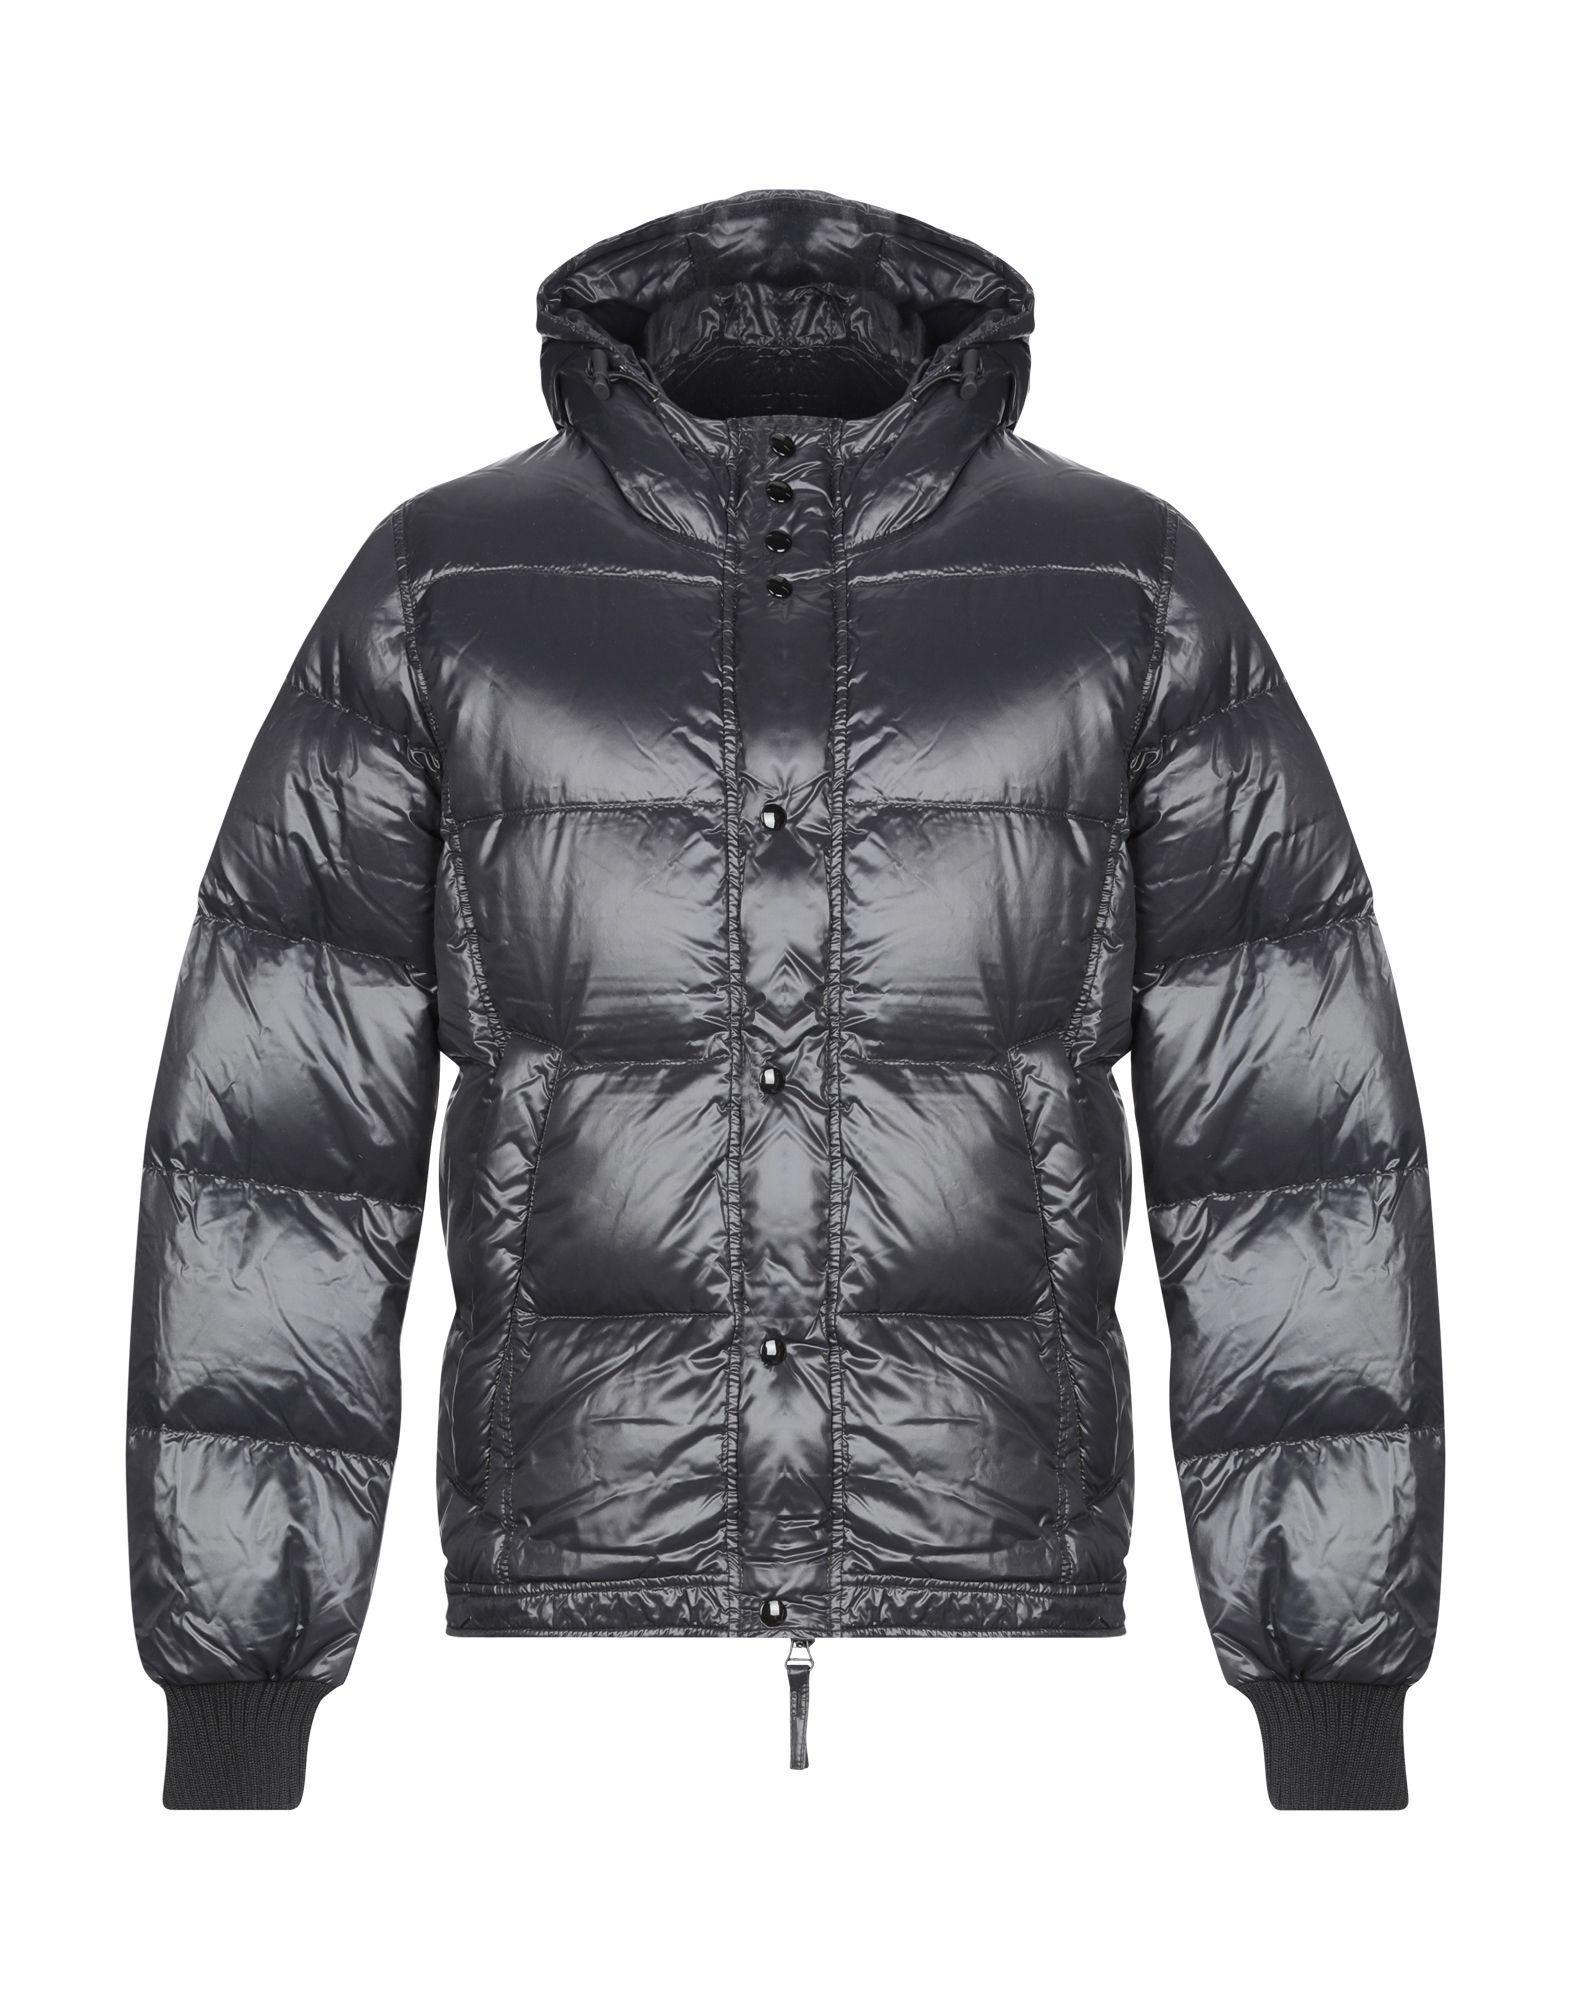 35f208f31b54 Lyst - Duvetica Down Jacket in Black for Men